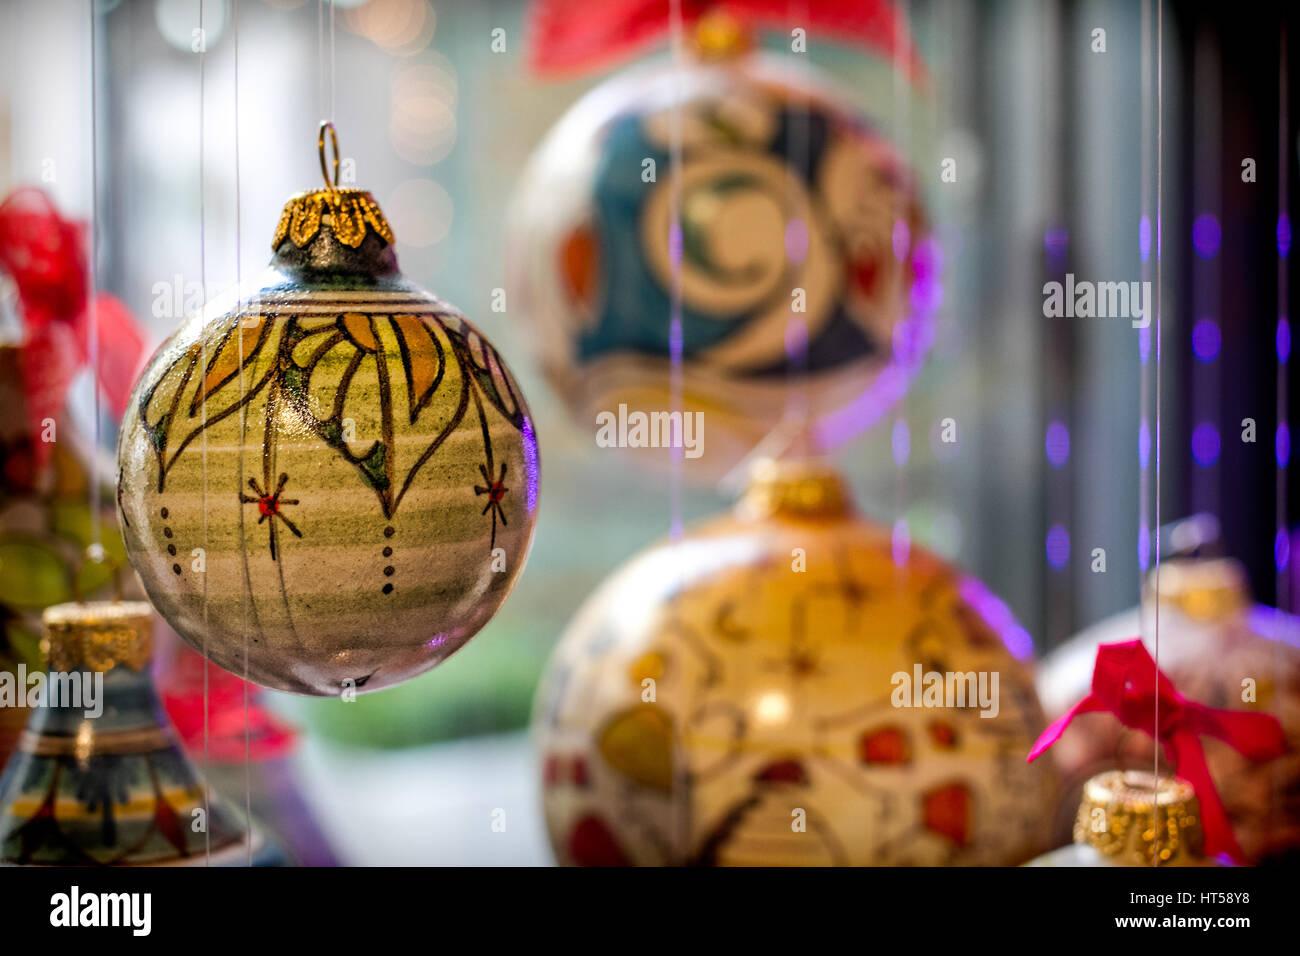 Traditional Christmas ornaments found in Vietri sul Mare, Italy. Stock Photo